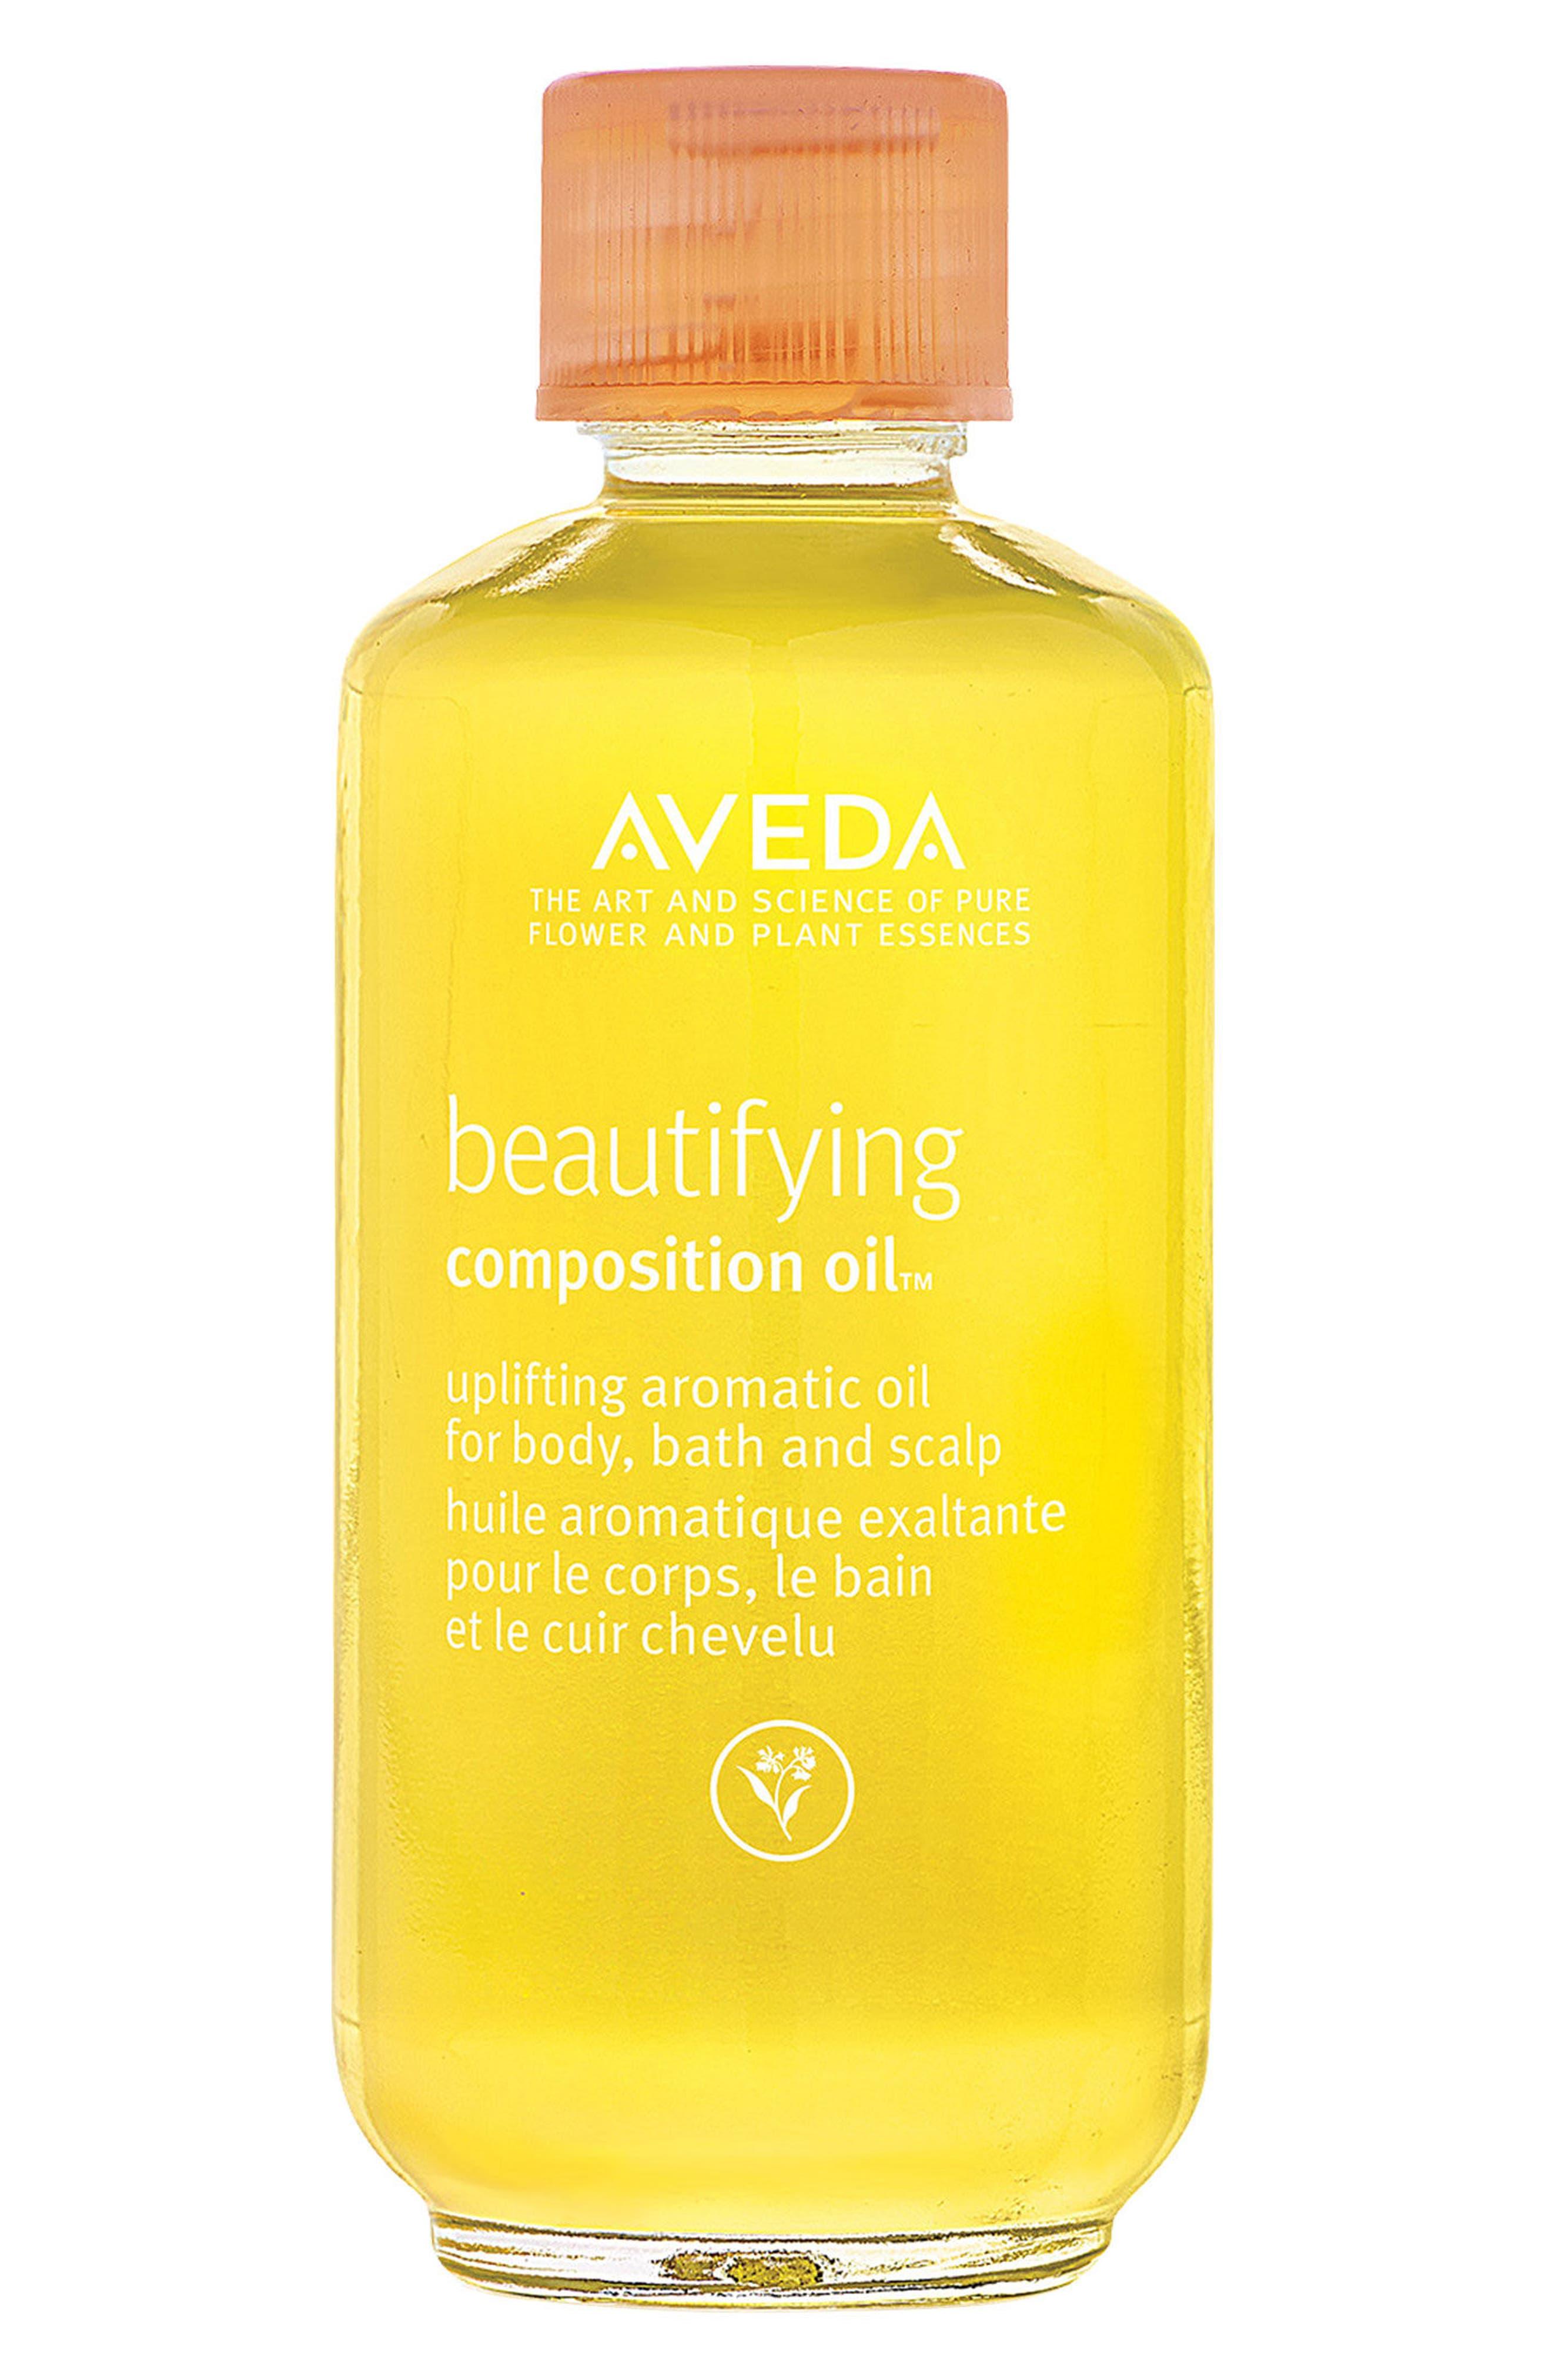 Aveda 'beautifying composition™' Moisturizing Oil